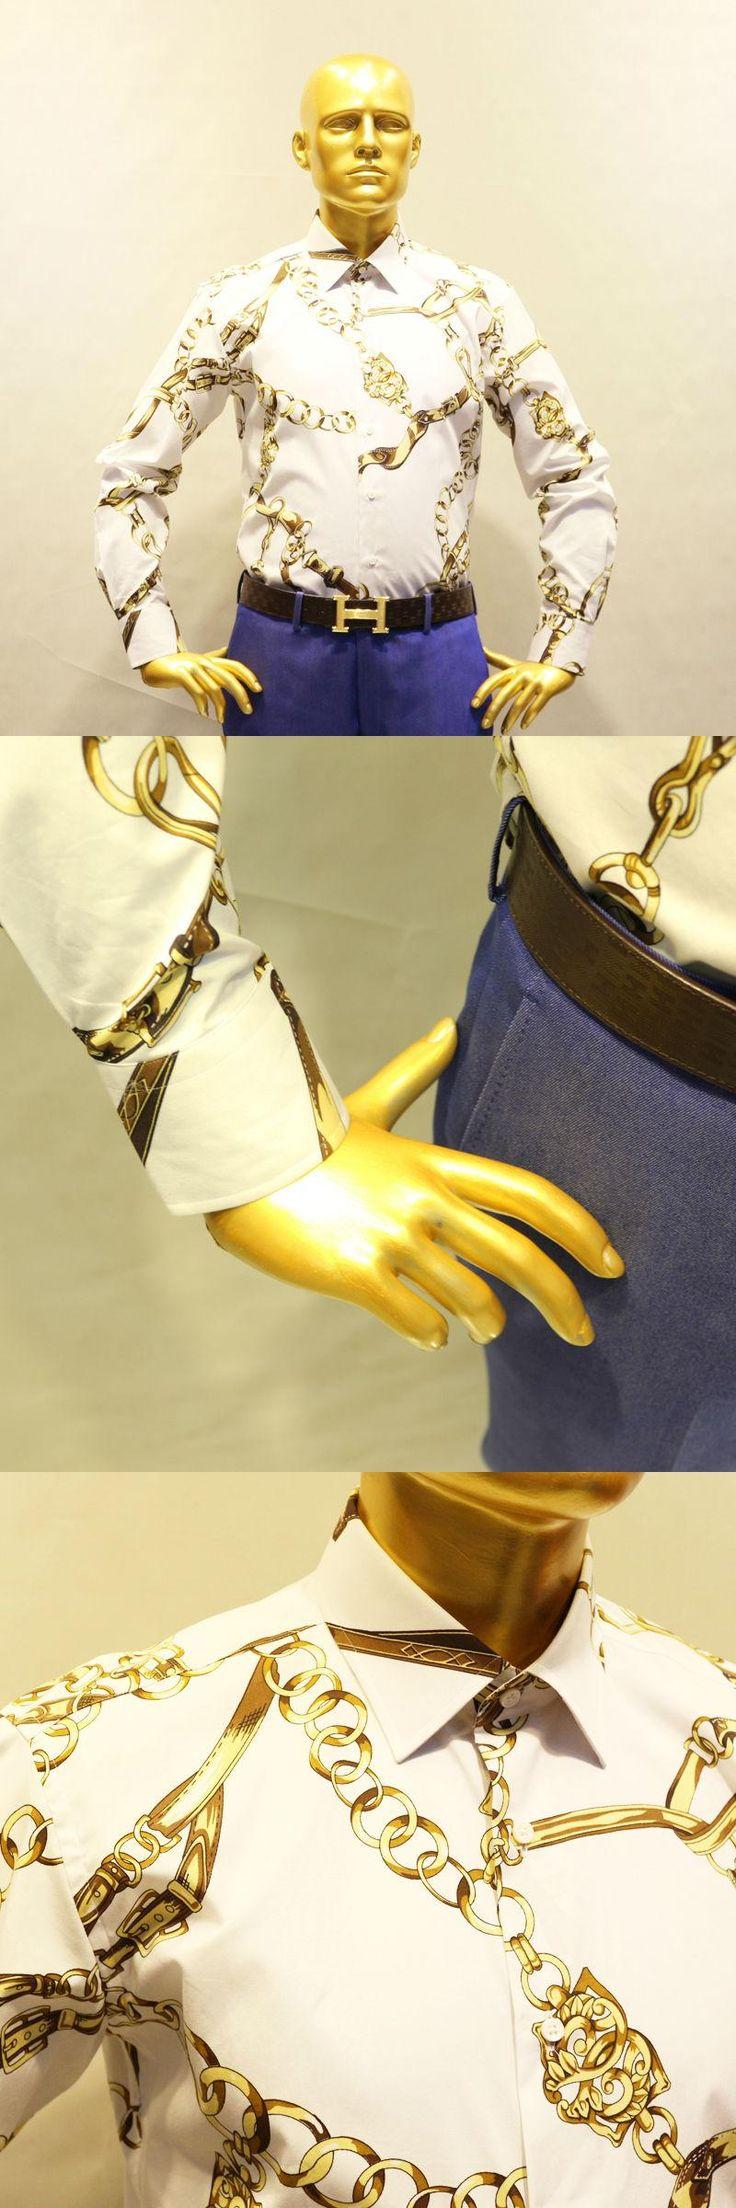 white with printed golden chain flower cotton dress shirt , man's custom tailor made casual fashion bespoke shirt 2018 VA